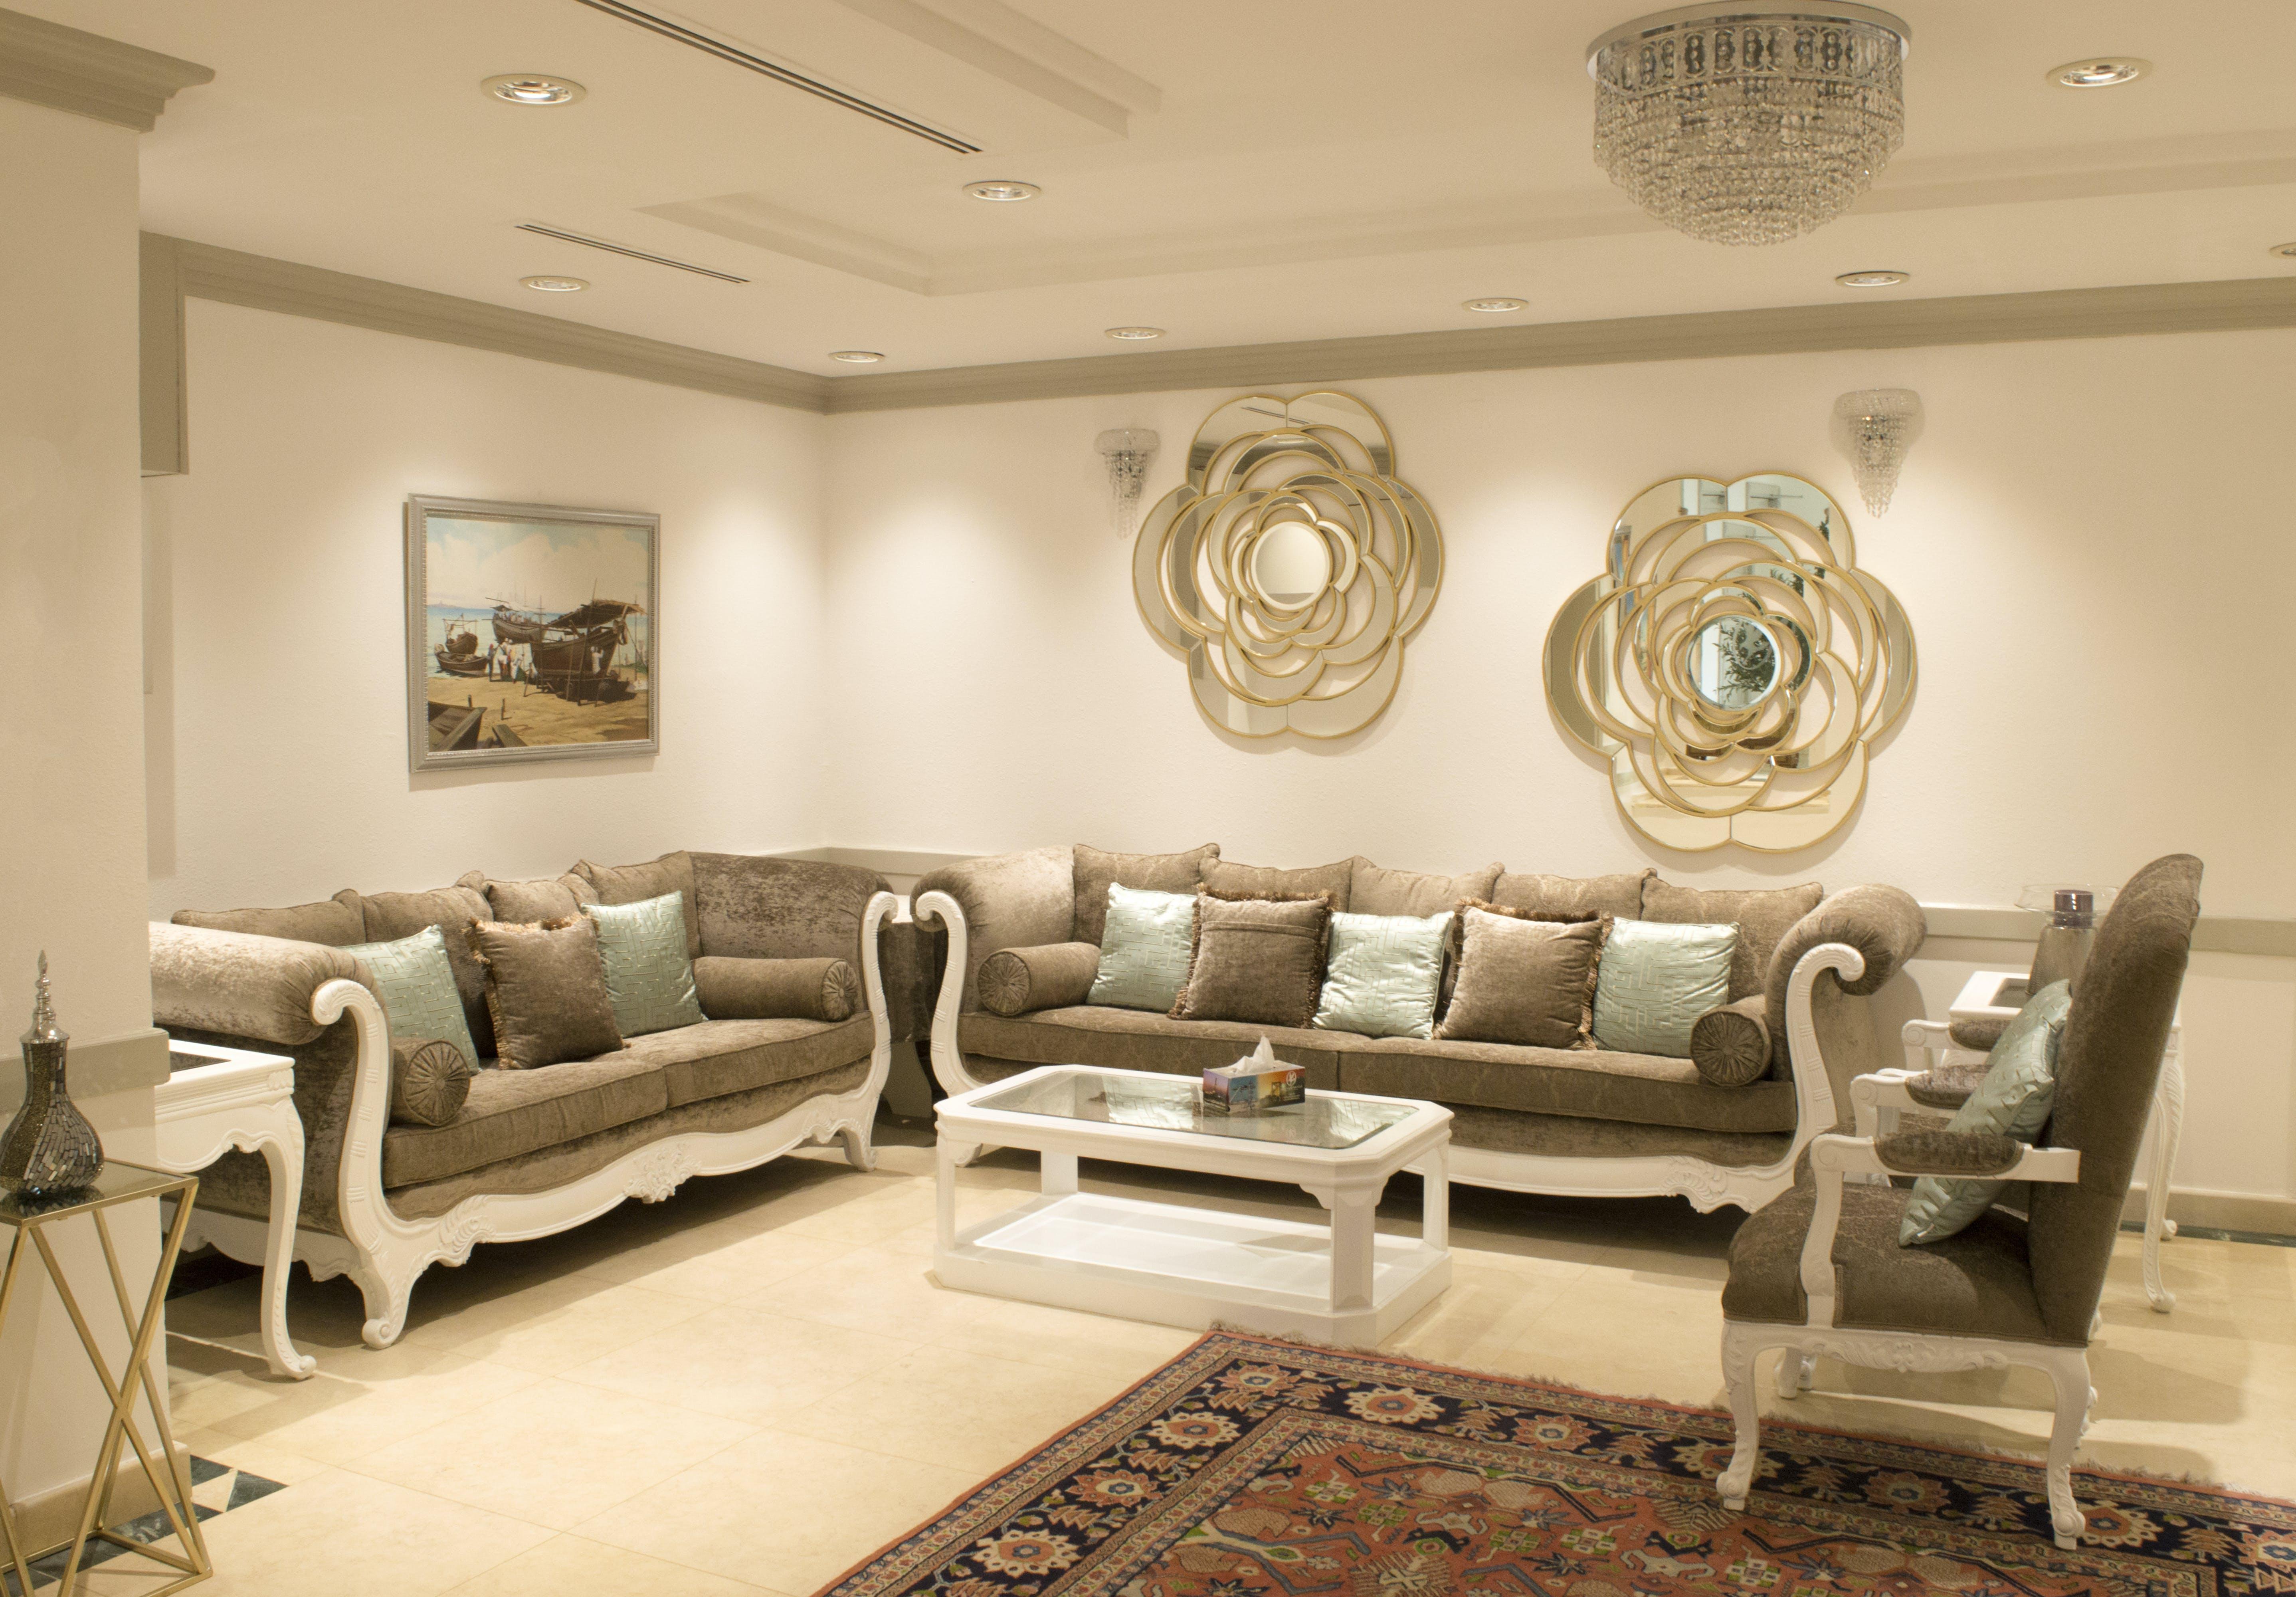 Free stock photo of lounge, furniture, sofas, formal lounge